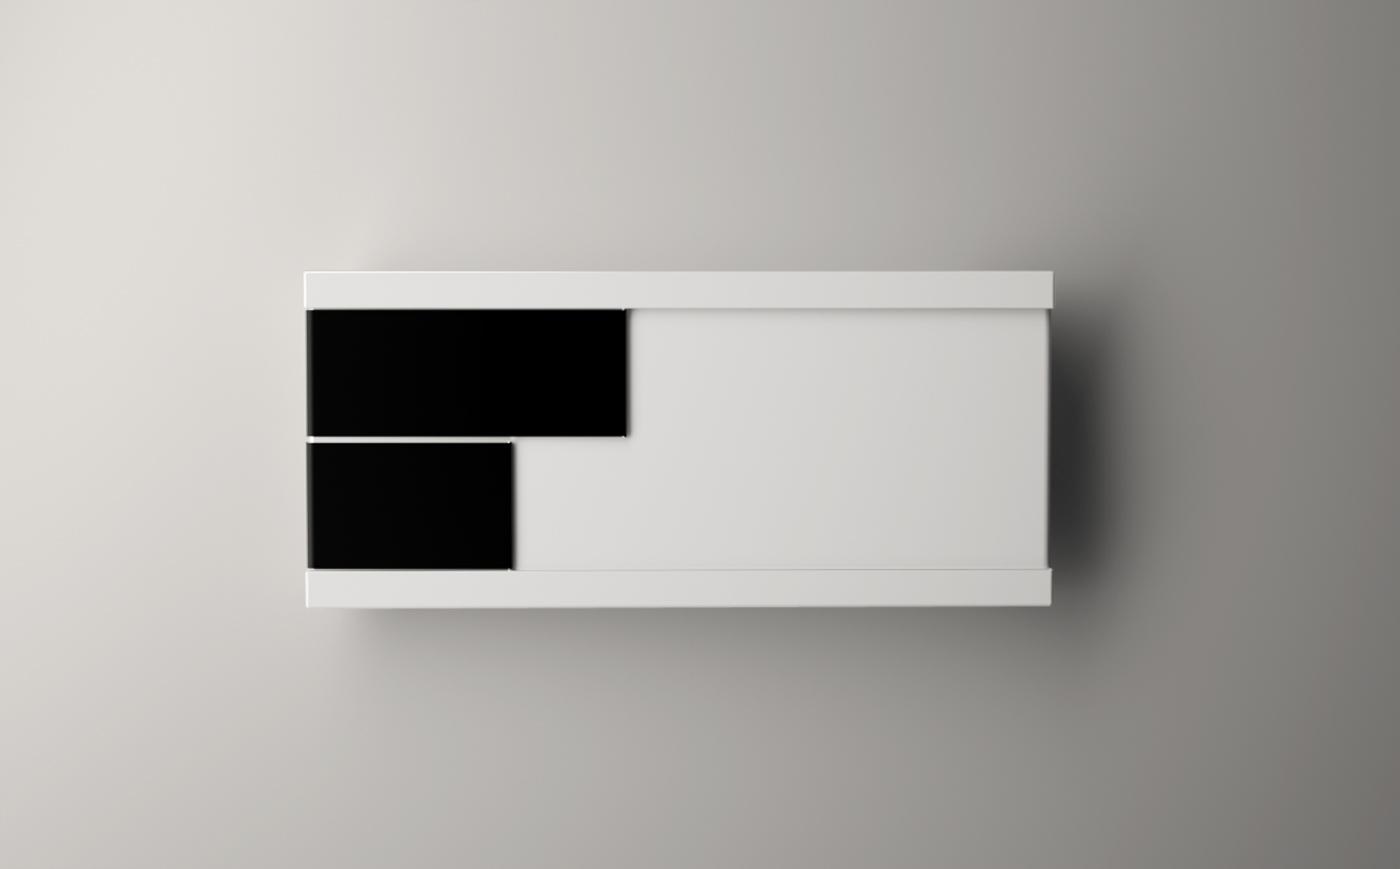 clock james tobin Interior timepiece minimal modern black and white mhin